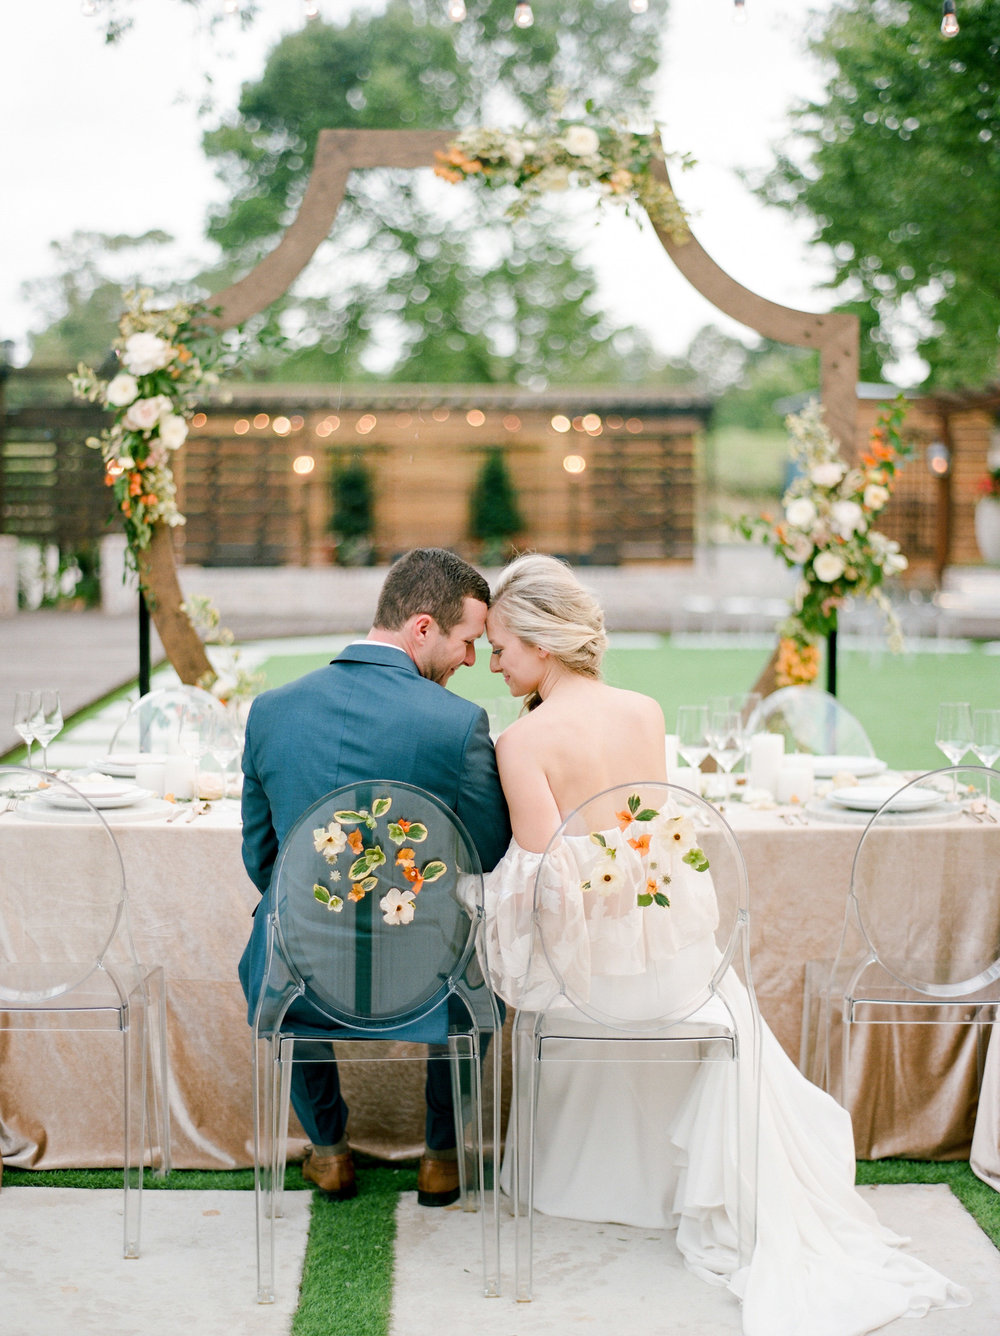 Houston-Wedding-Photographer-Fine-Art-Film-Destination-Style-Me-Pretty-Austin-Dallas-New-Orleans-Dana-Fernandez-Photography-2.jpg